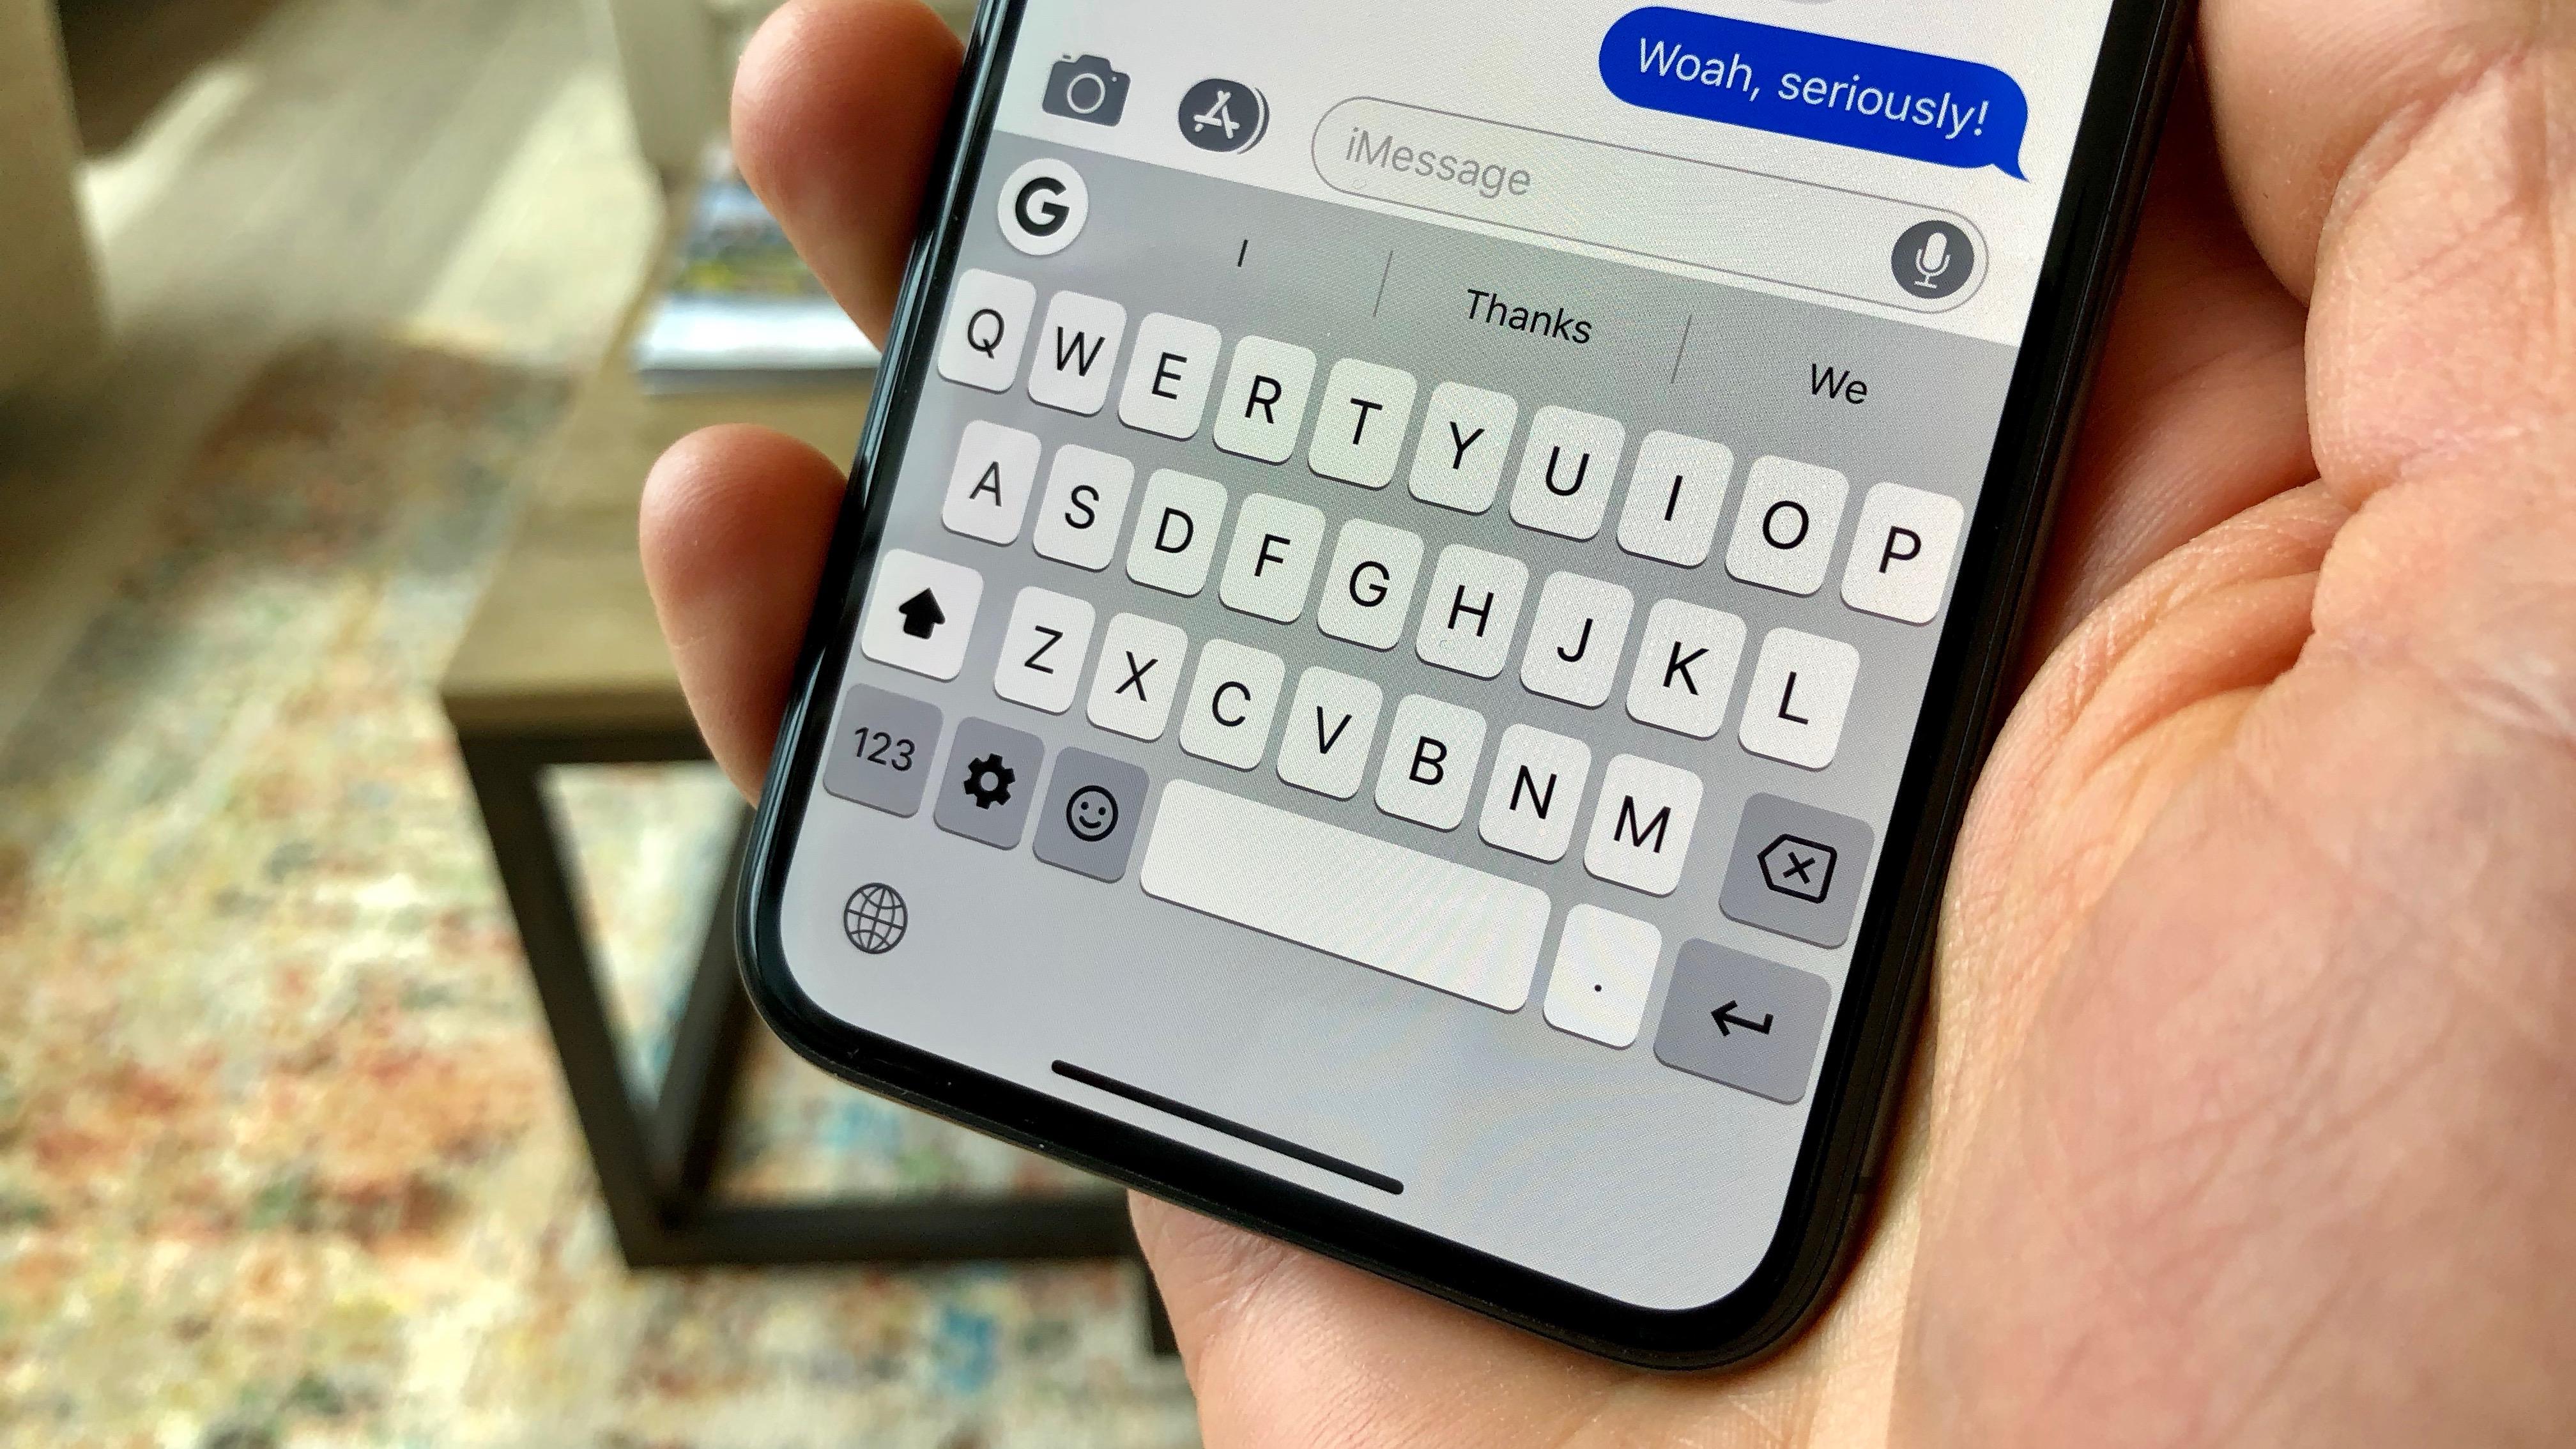 iPhone & iPad: How to customize keyboard shortcuts